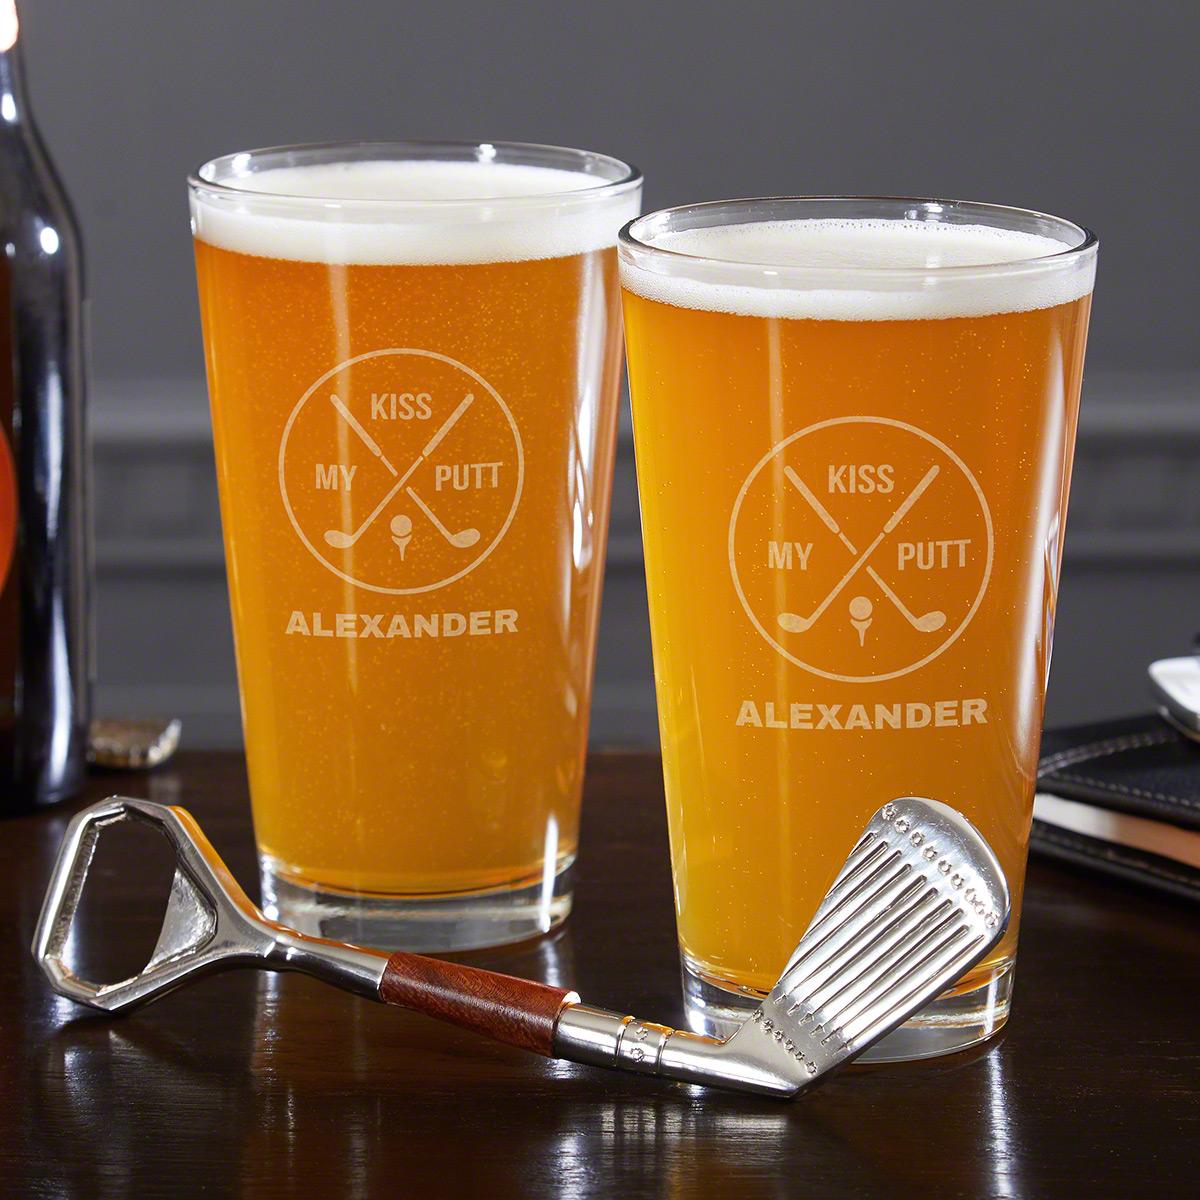 Kiss My Putt Custom Beer Glass and Bottle Opener Set